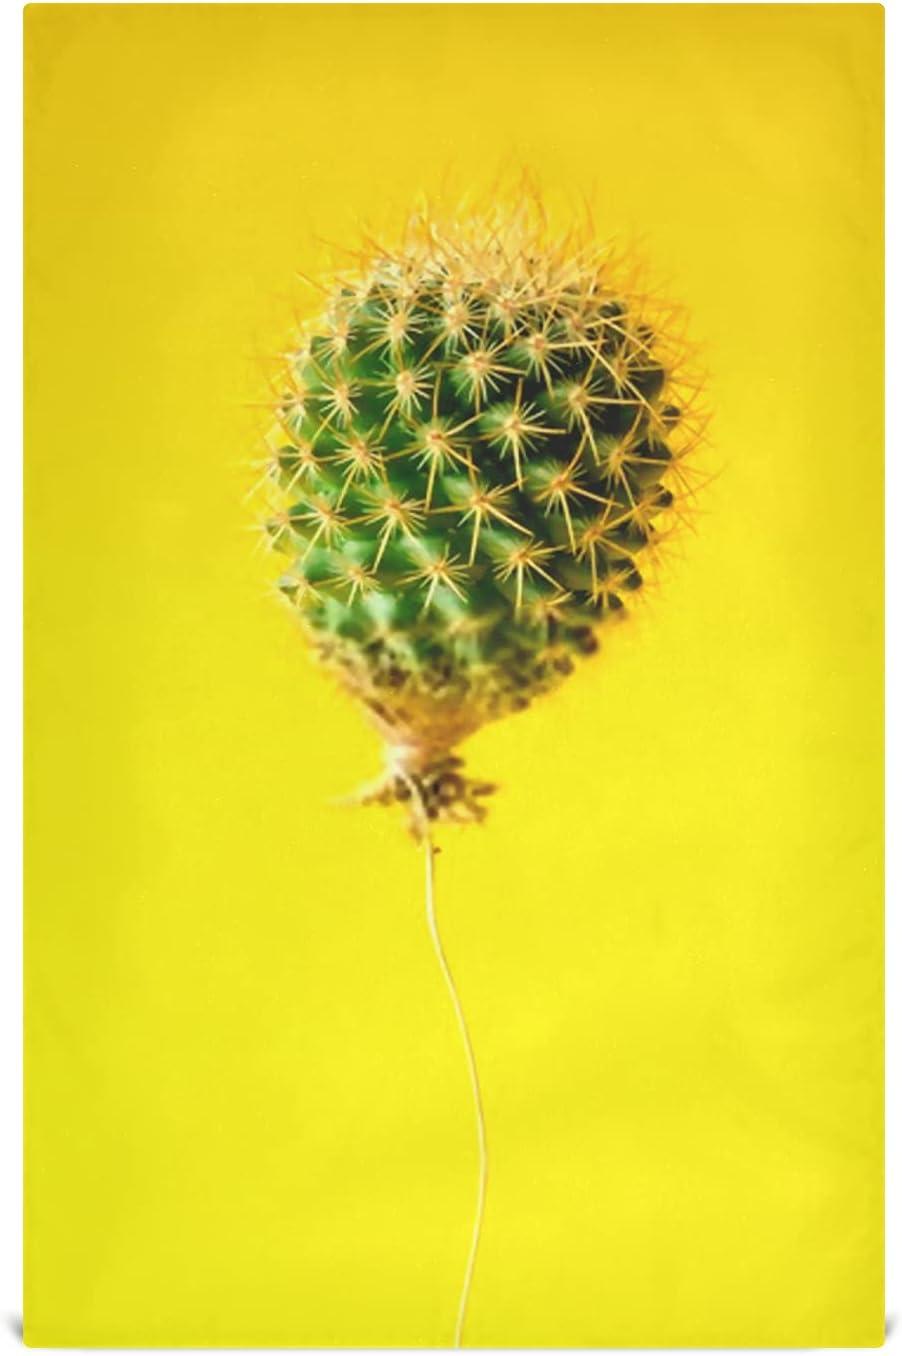 JIUCHUAN Oklahoma City Mall Kitchen Dish Towel Set 6 Cactus On Balloon Yello Courier shipping free Bright